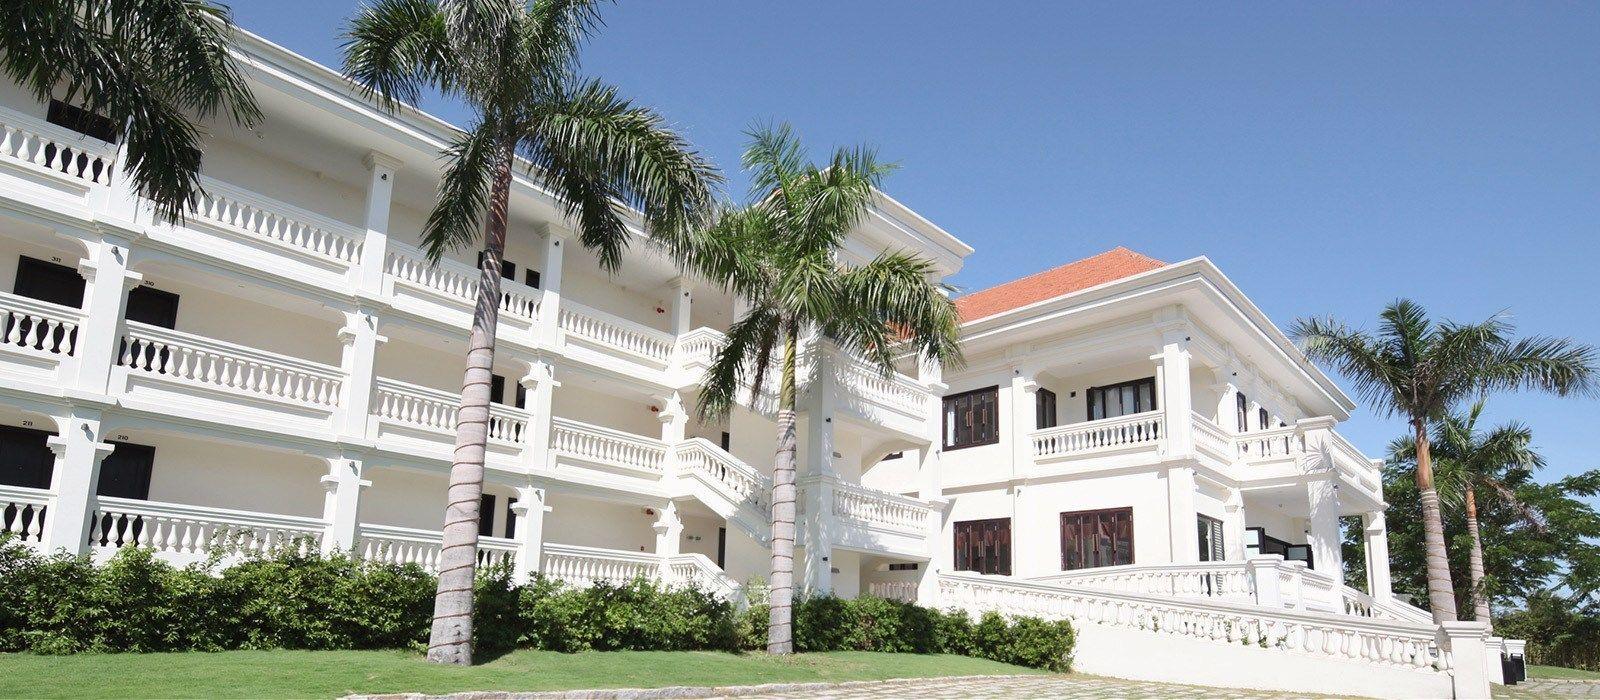 Hotel Boutique Hoi An Resort Vietnam